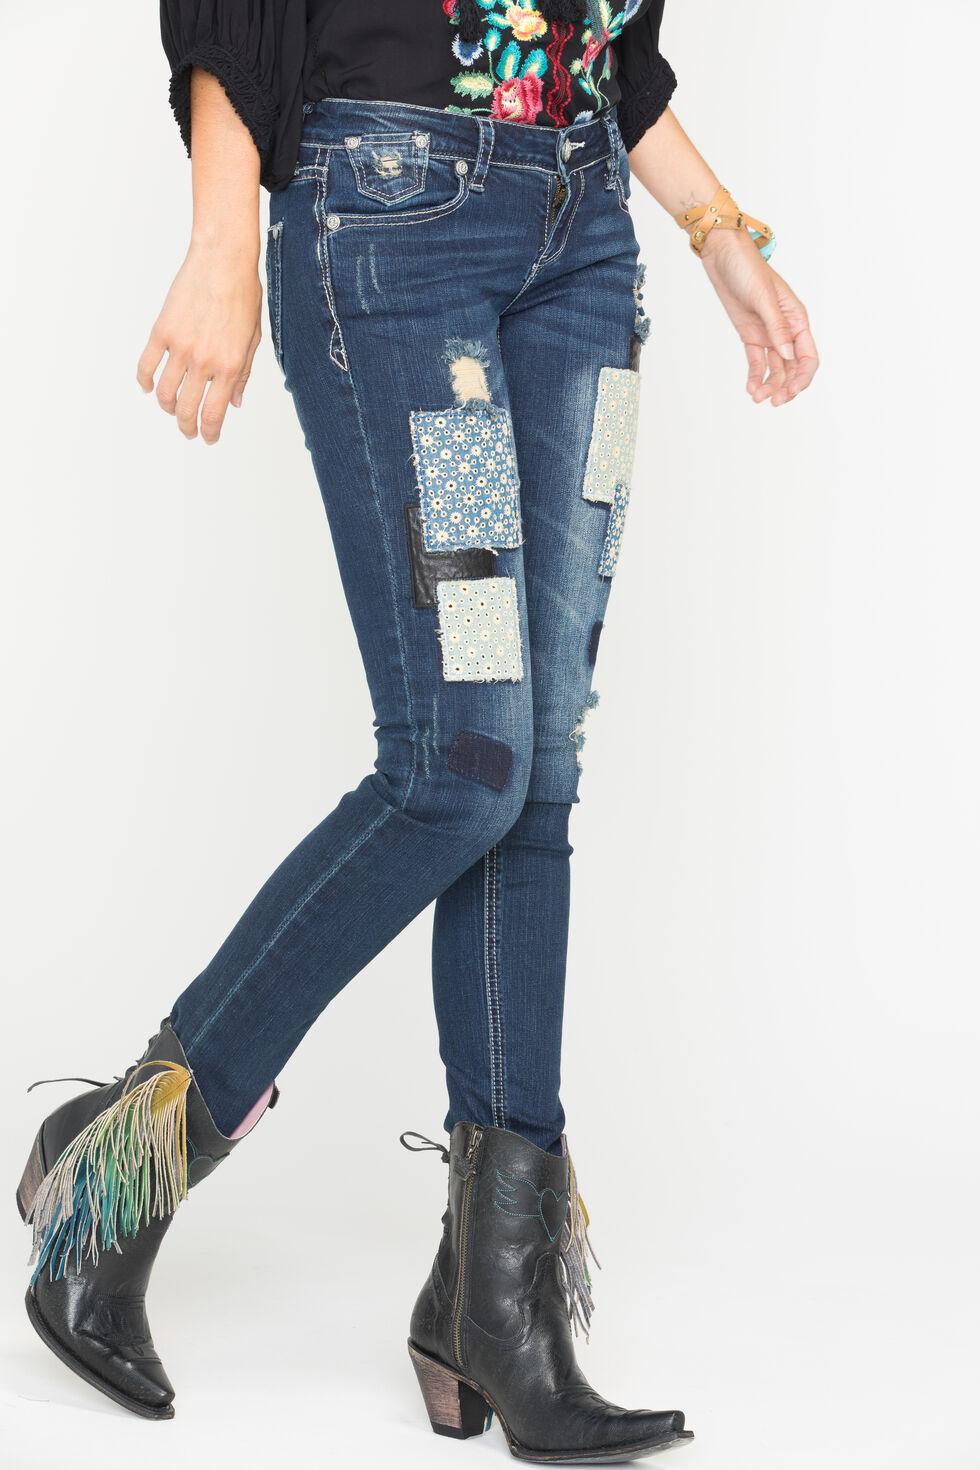 Grace in LA Women's Skinny Patchwork Jeans , Indigo, hi-res